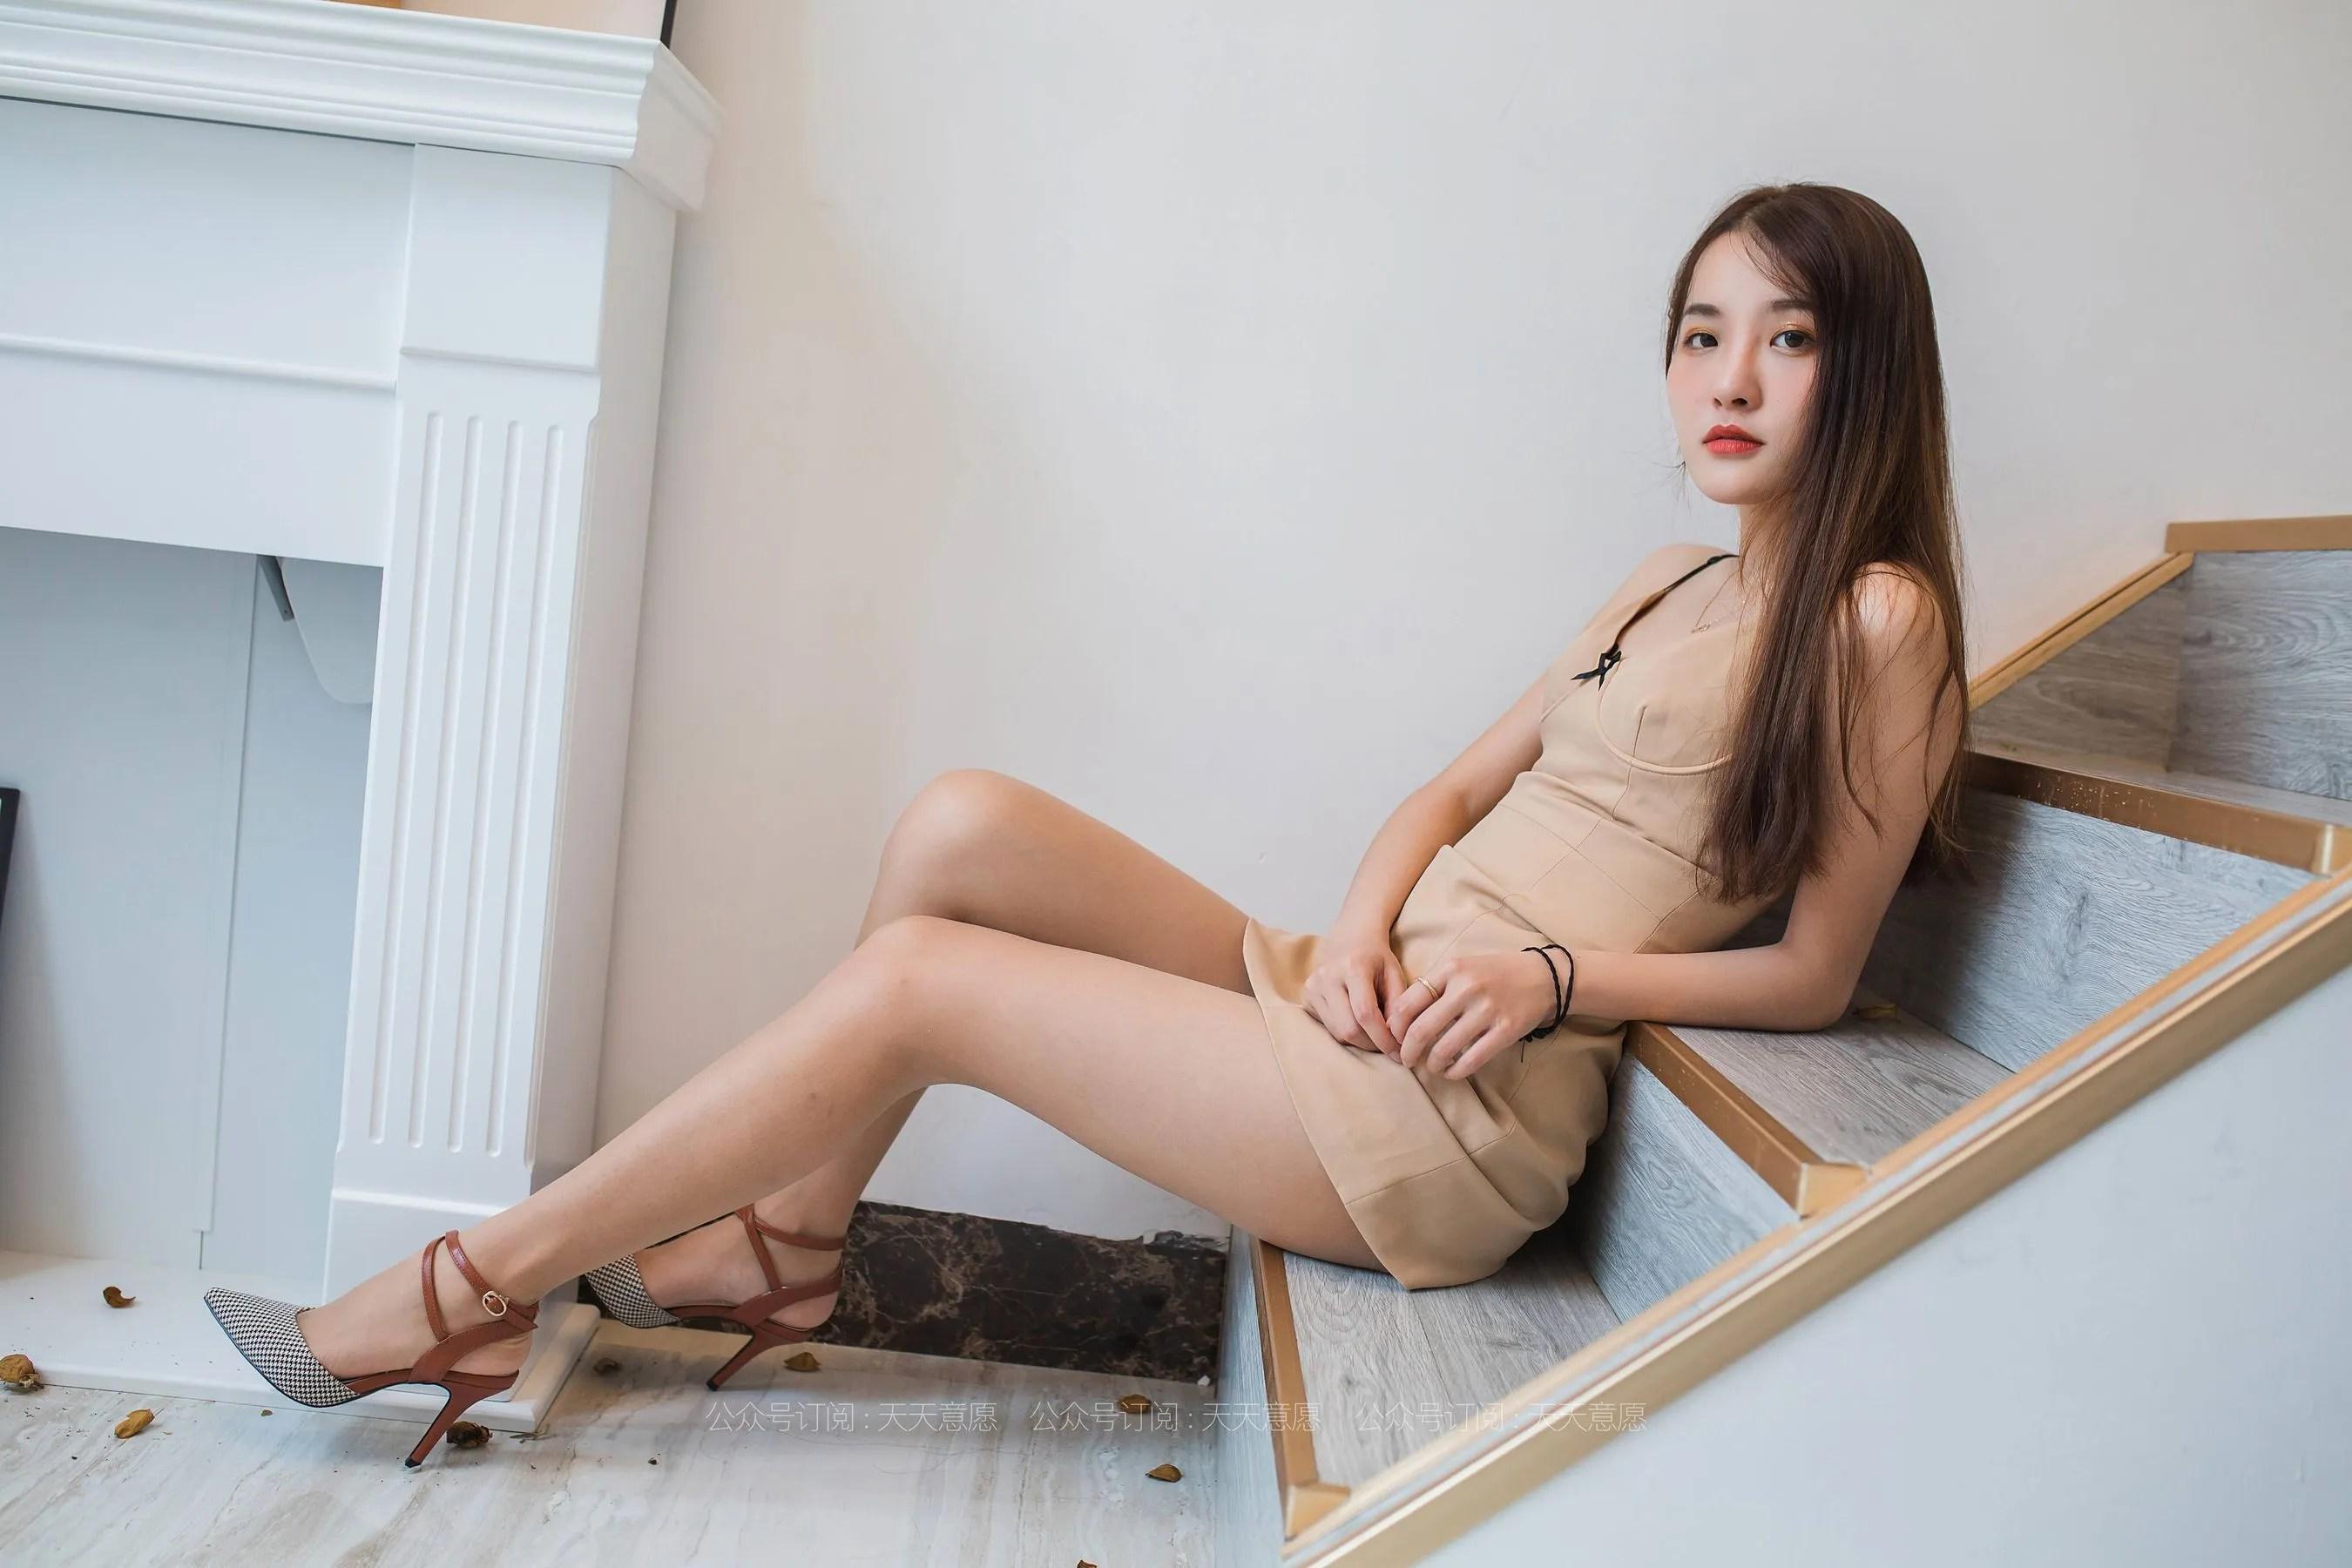 [IESS] 丝享家 770 婉萍《邻家甜美女孩》 丝袜美腿写真[90P]插图(5)